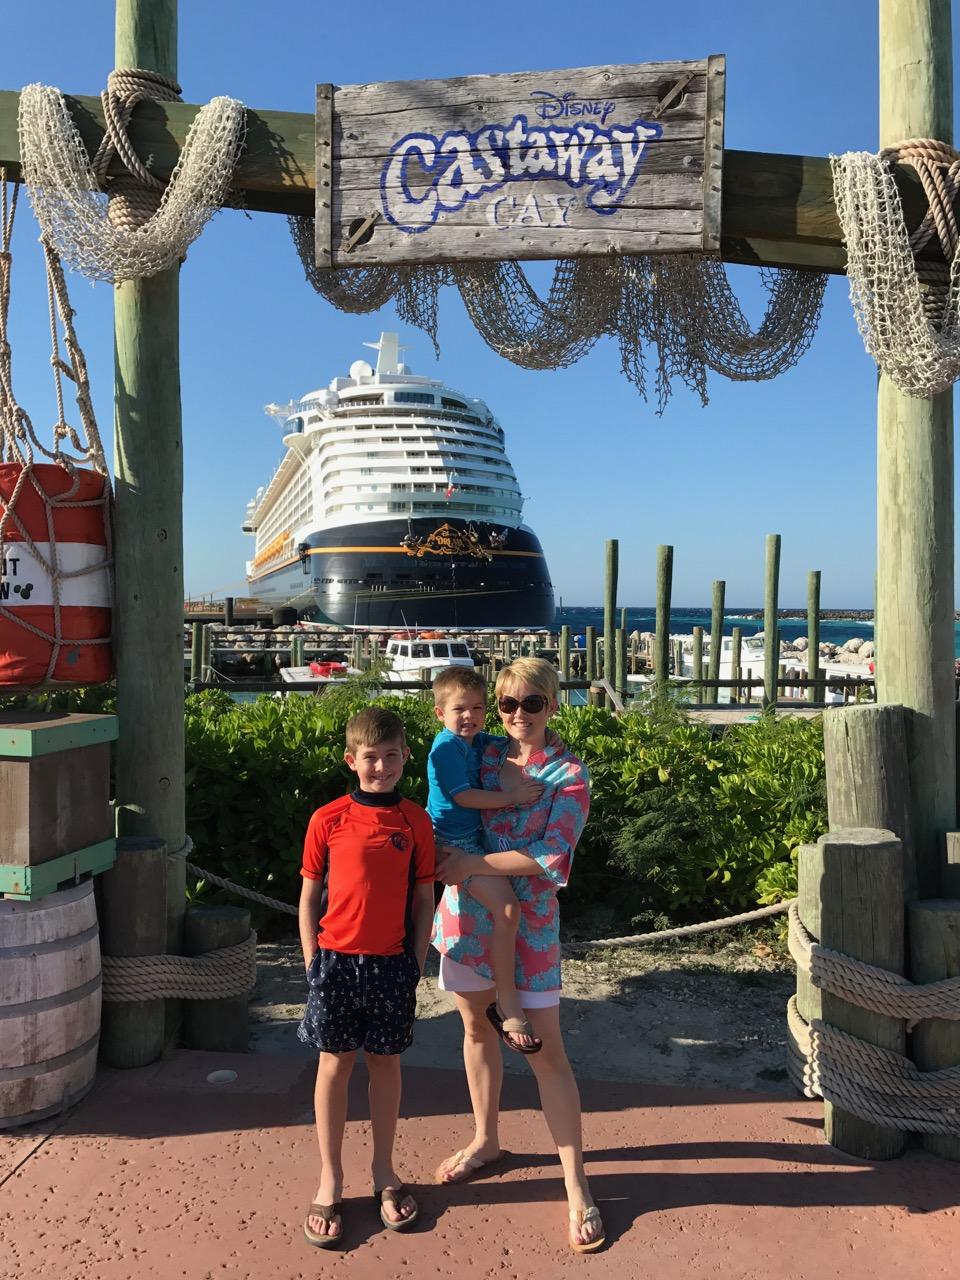 Disney Dream Castaway Cay Photo Op